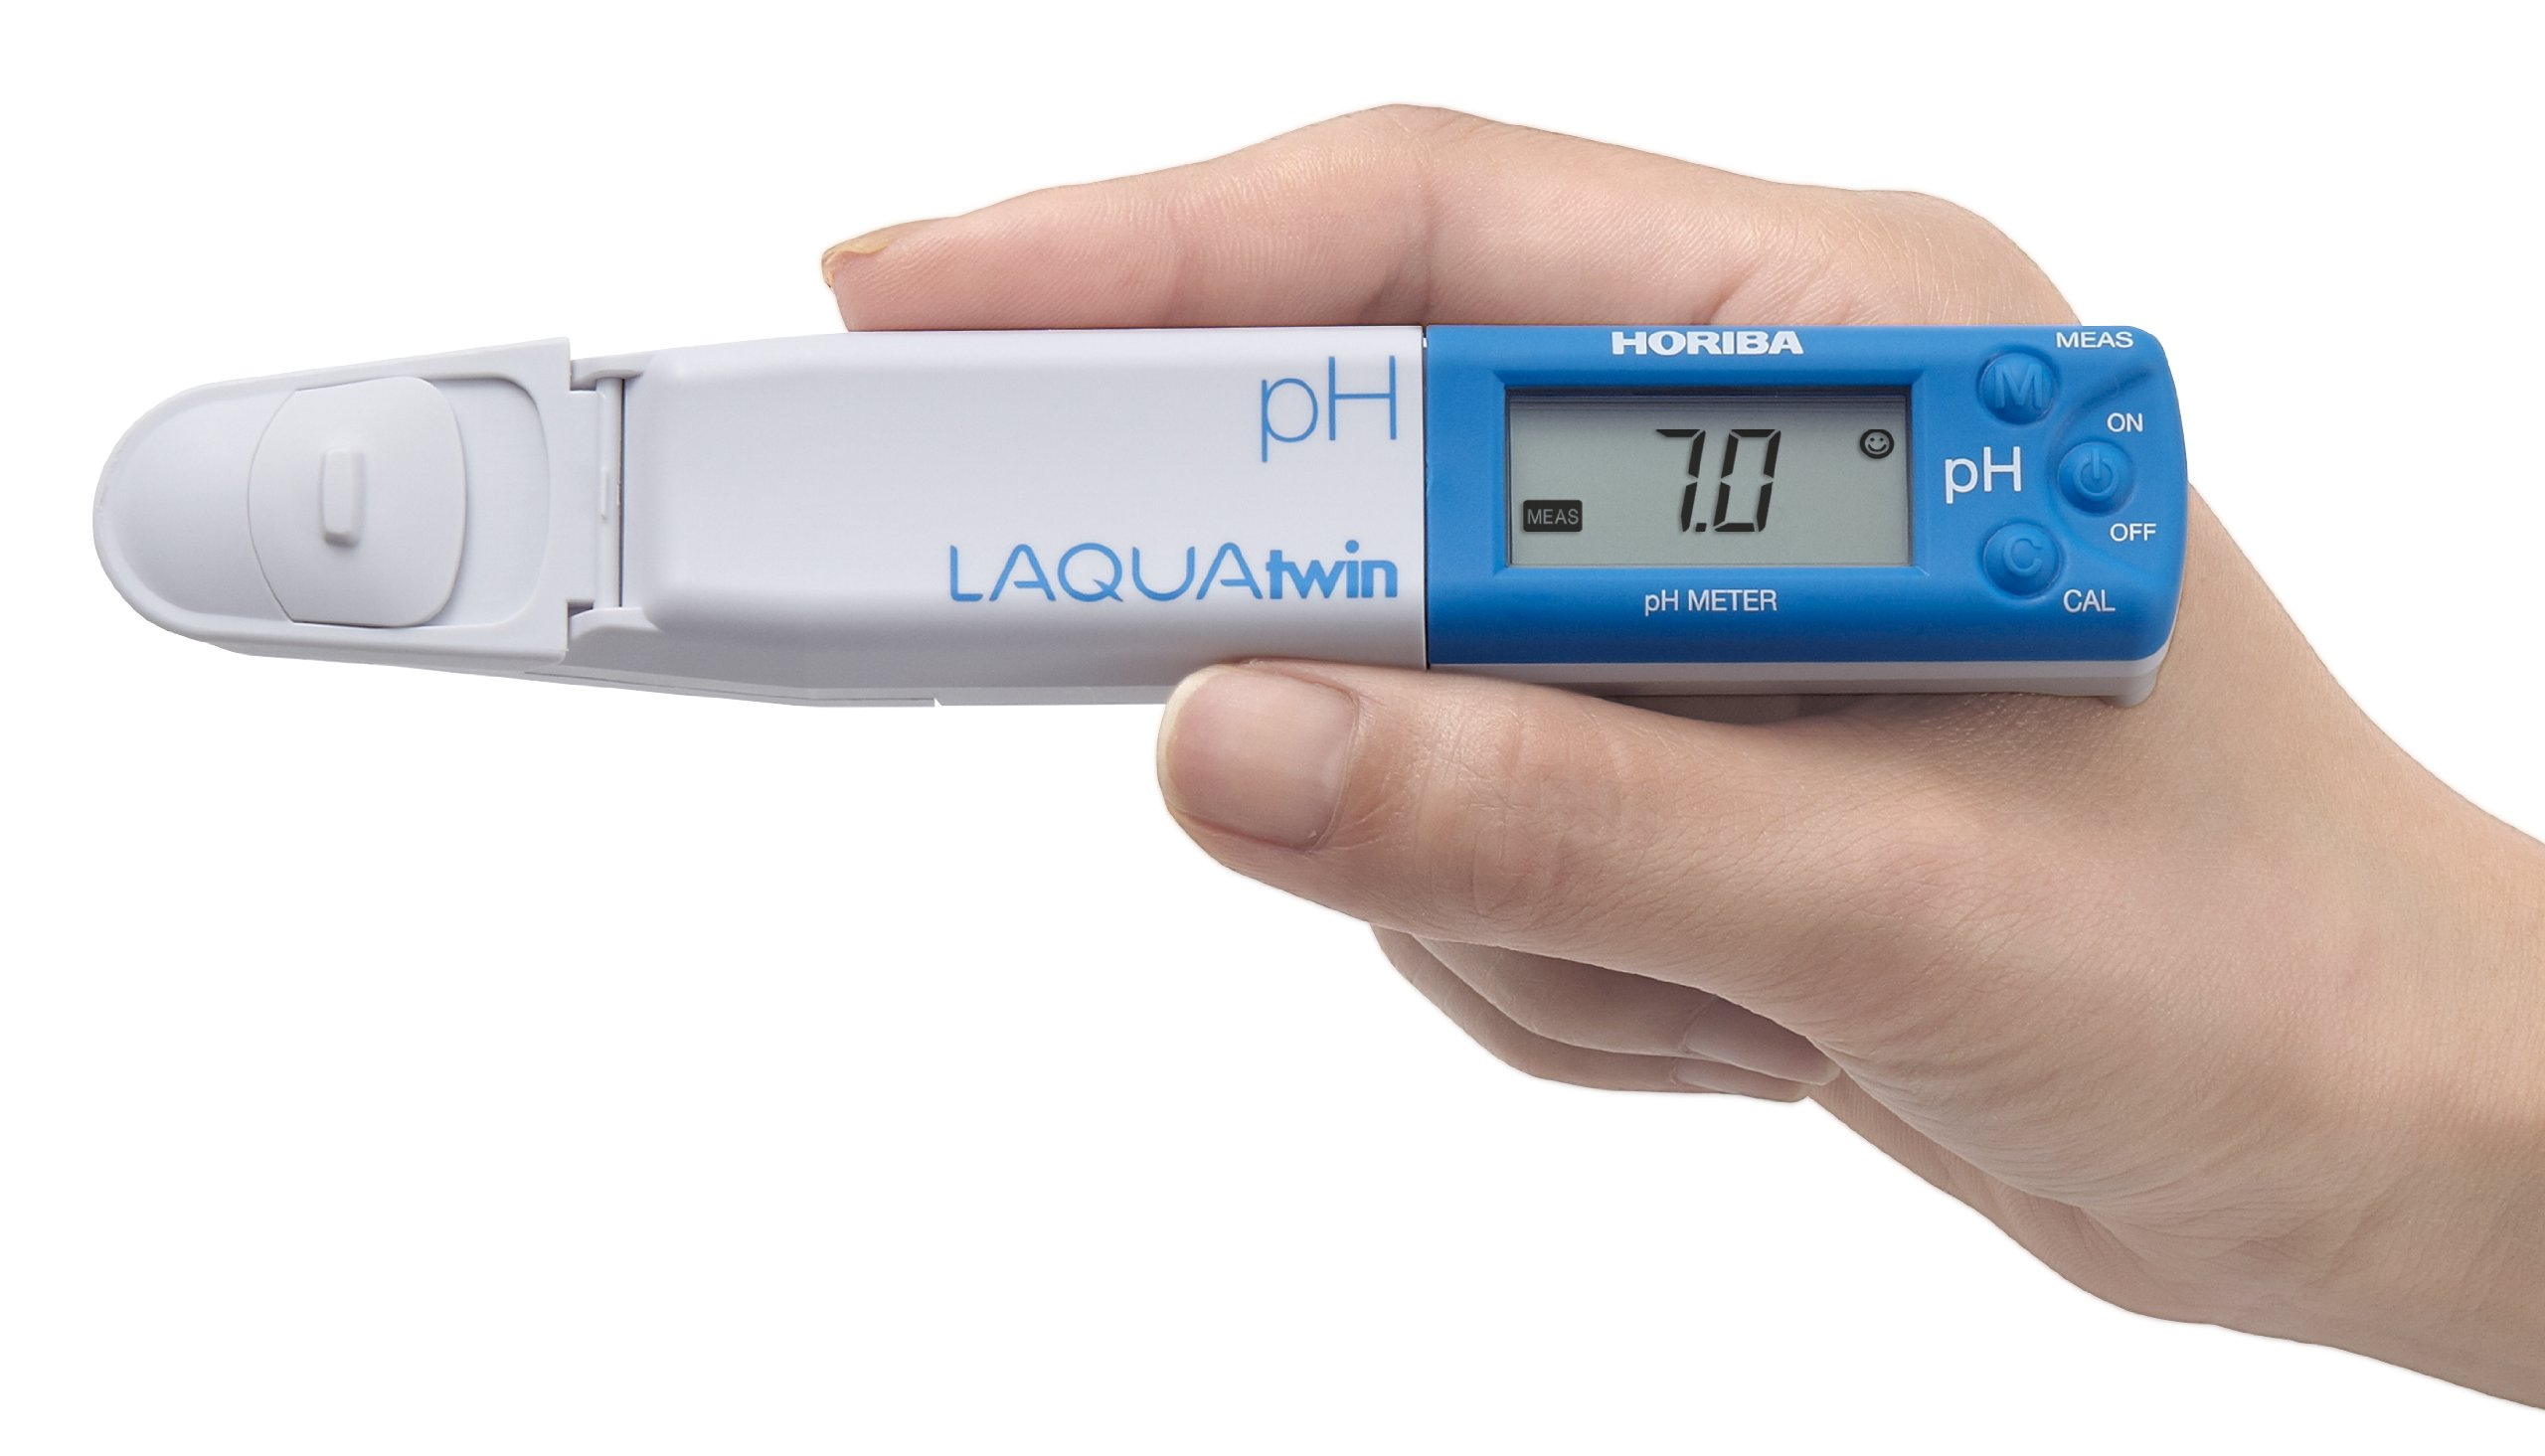 Horiba 3999960122 Model pH-11 Compact pH Meter, 1.5'' Height, 4'' Width, 7.25'' Length